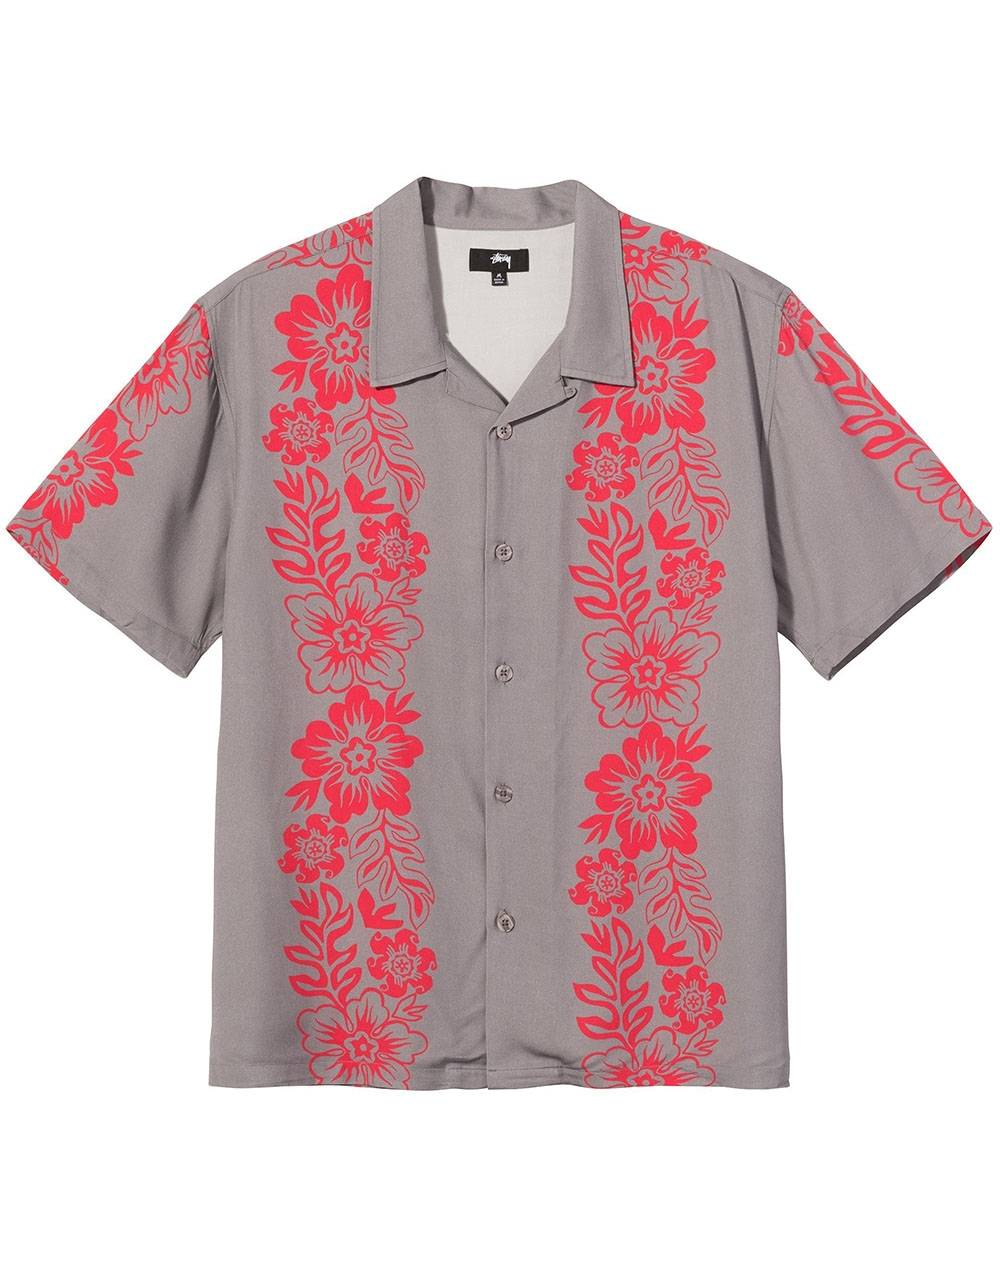 Stussy Hawaiian pattern shirt - grey Stussy Shirt 155,00€